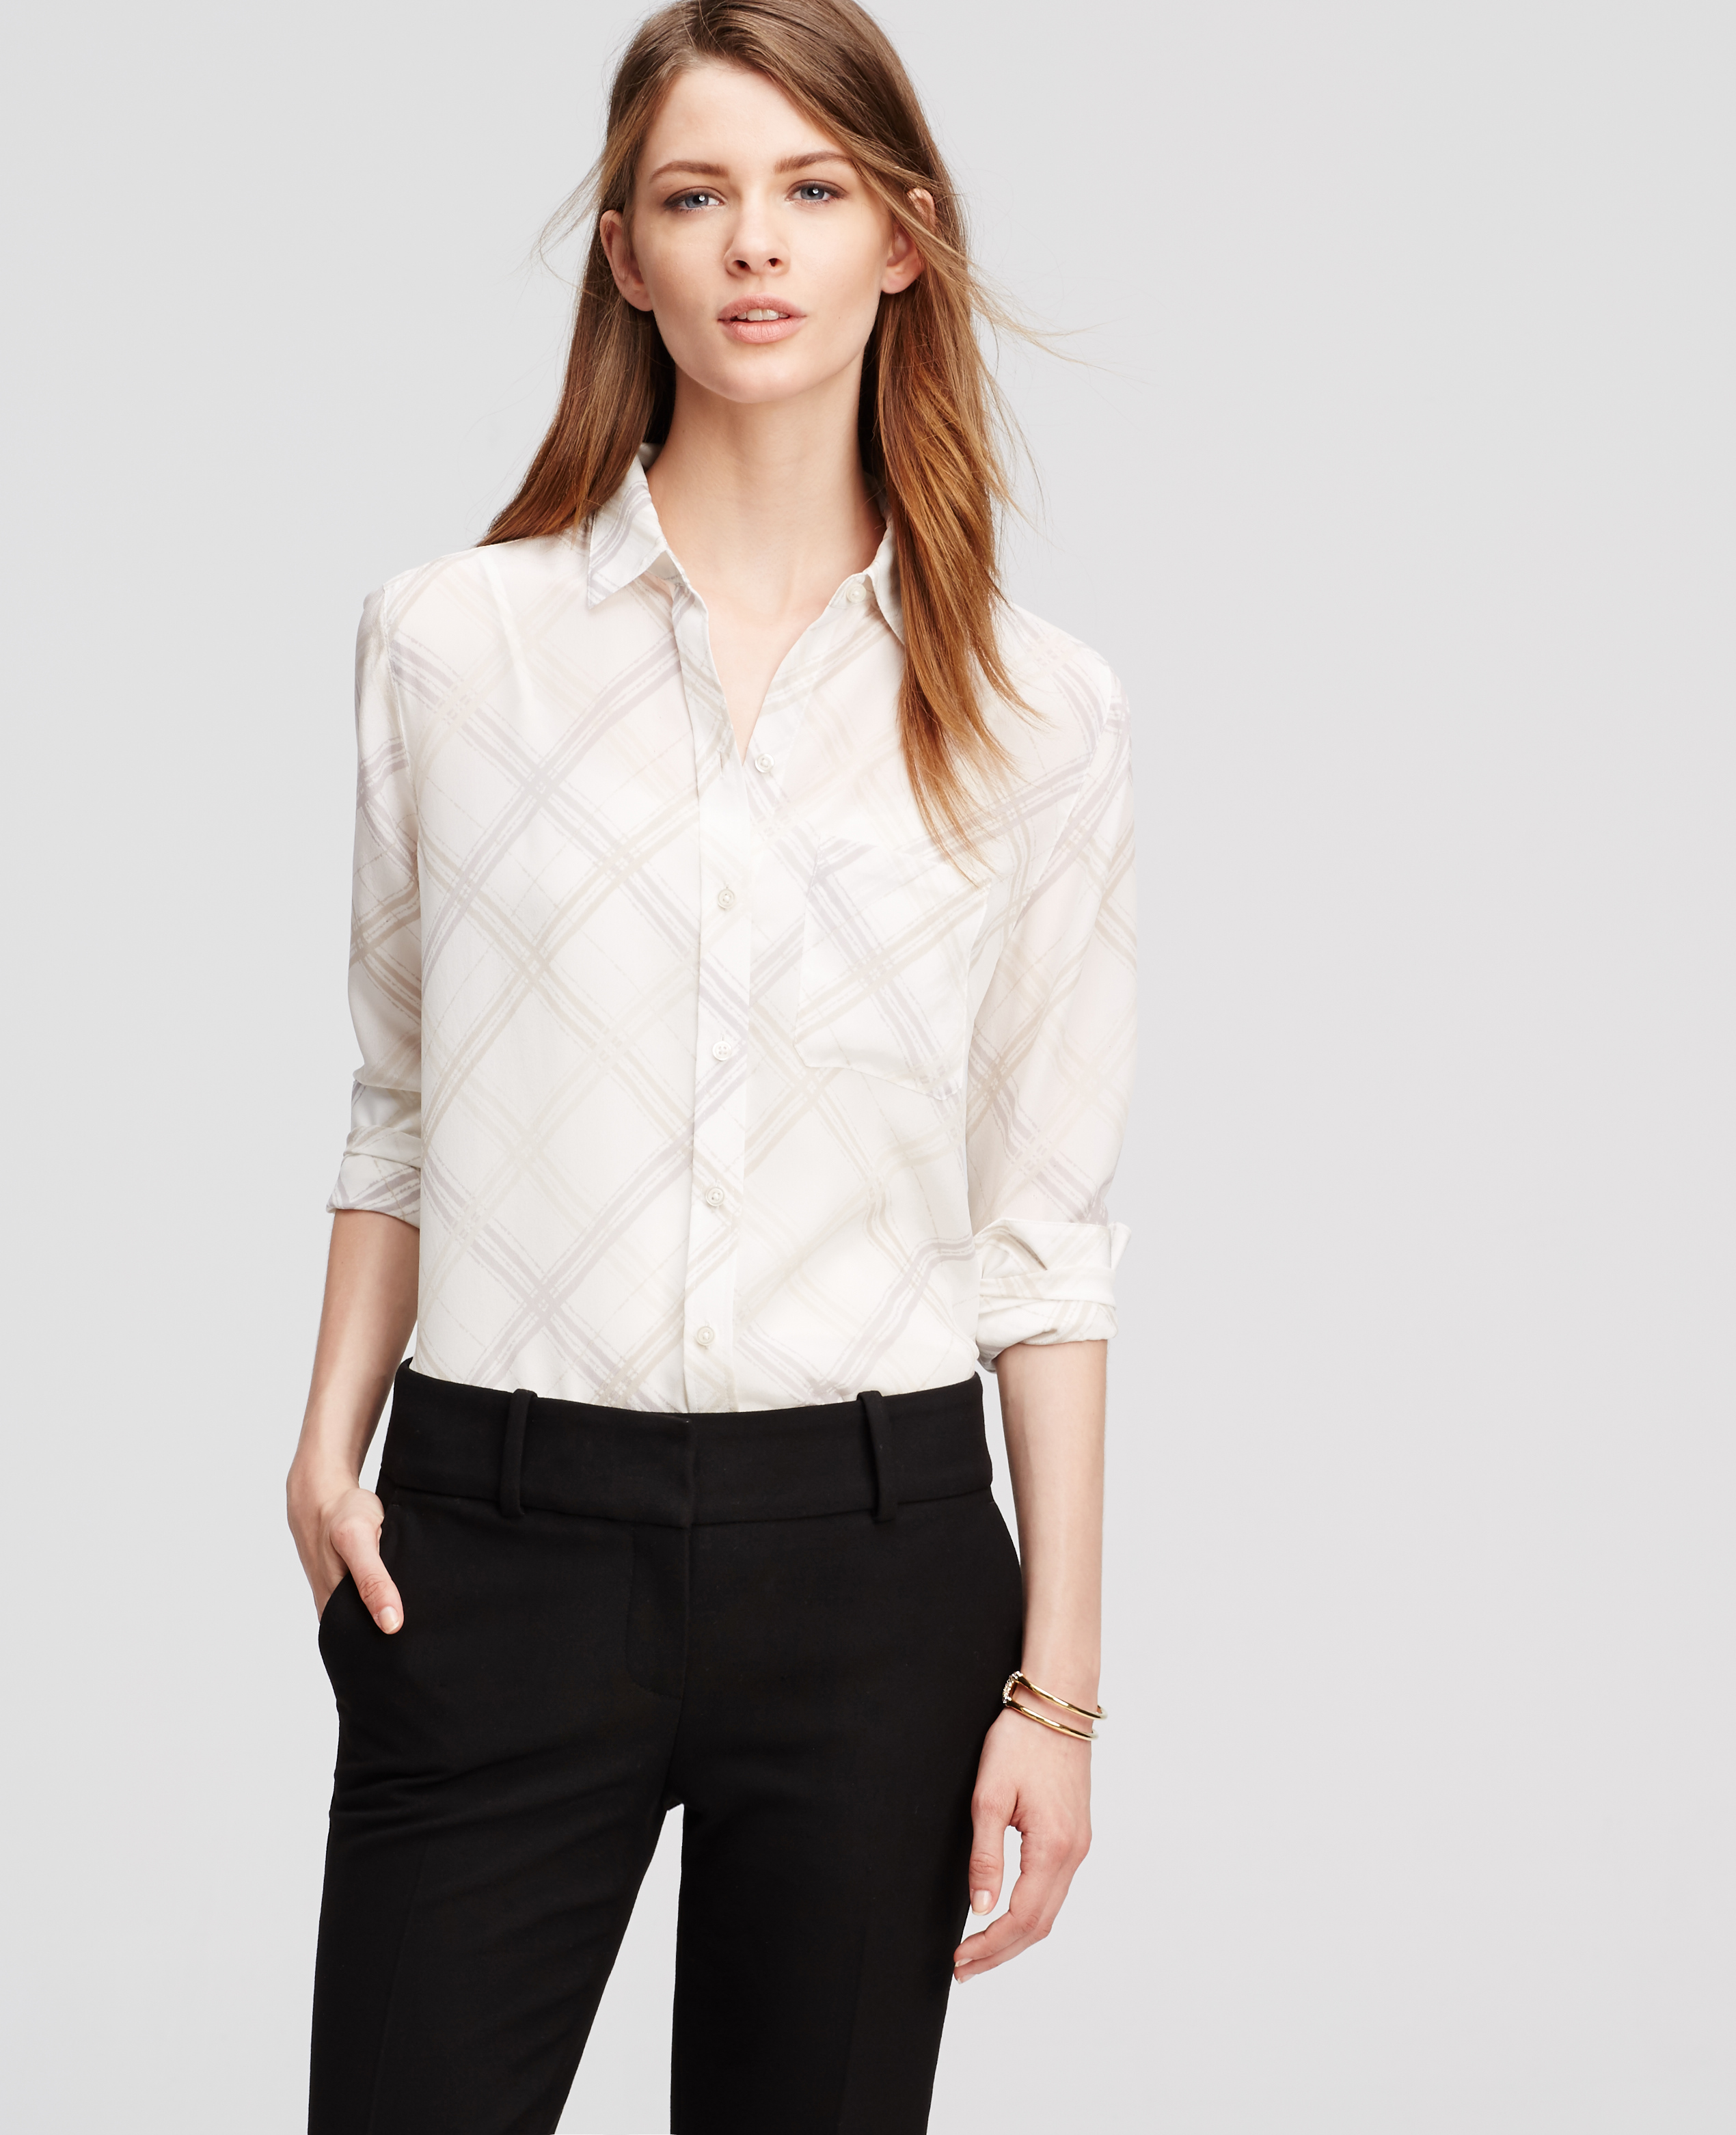 White silk blouse ann taylor collar blouses for Non see through white dress shirt